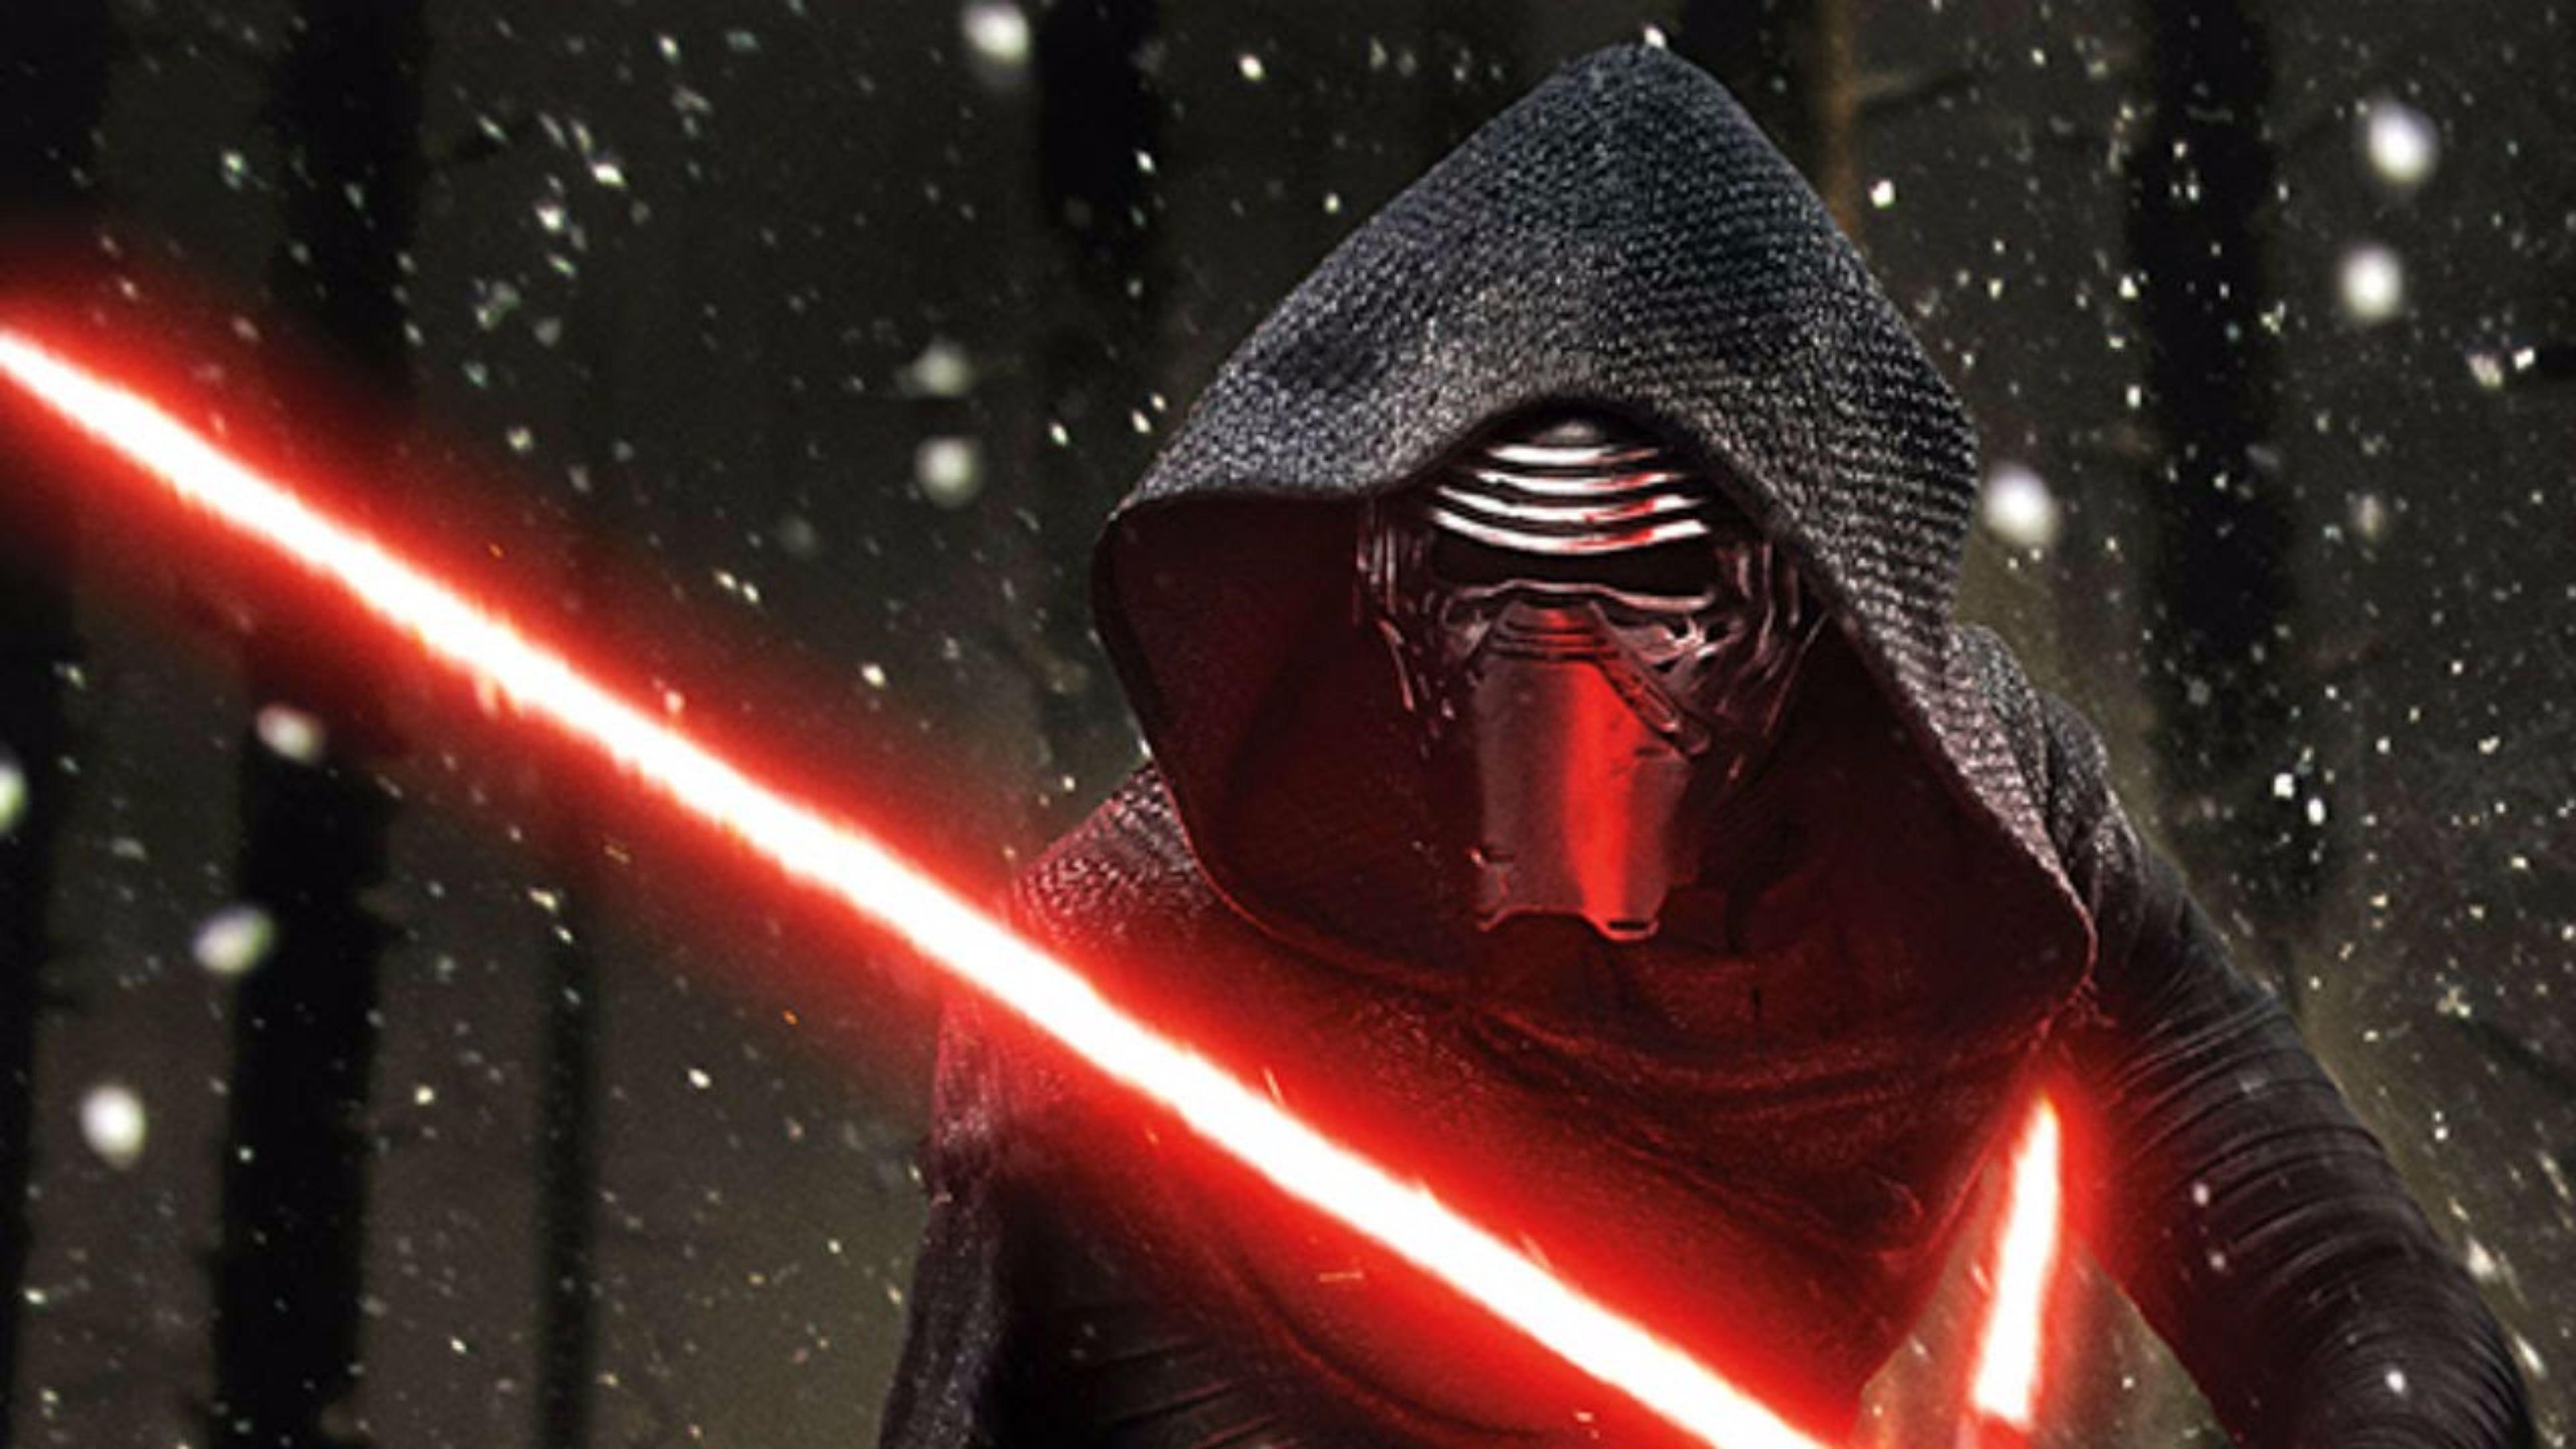 2016 Star Wars The Force Awakens 4K Wallpaper 4K Wallpaper 3840x2160